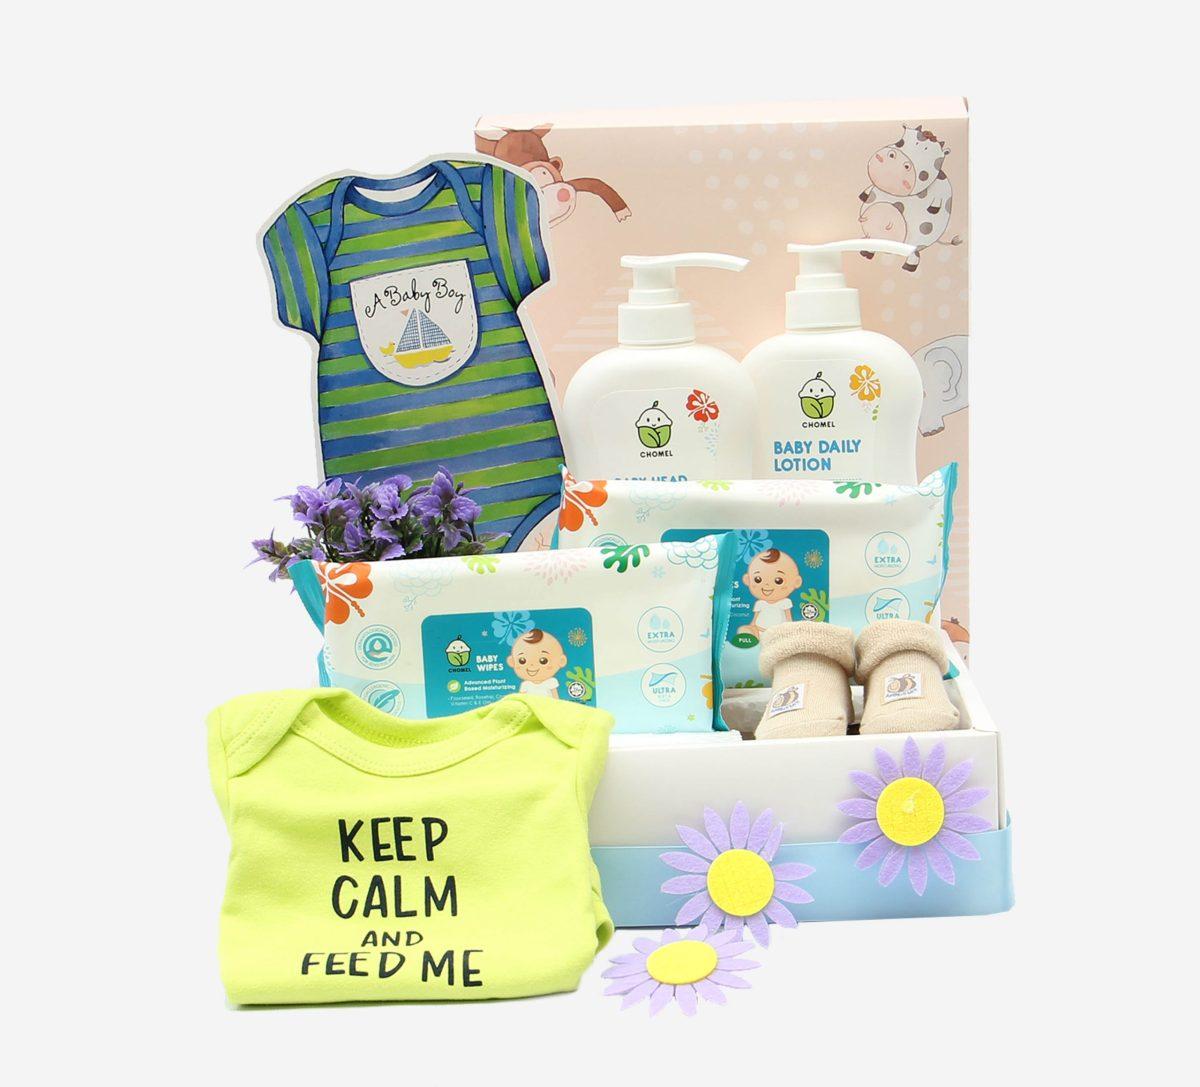 Hello Si Comel | New born baby gifts | Eska Creative Gifting